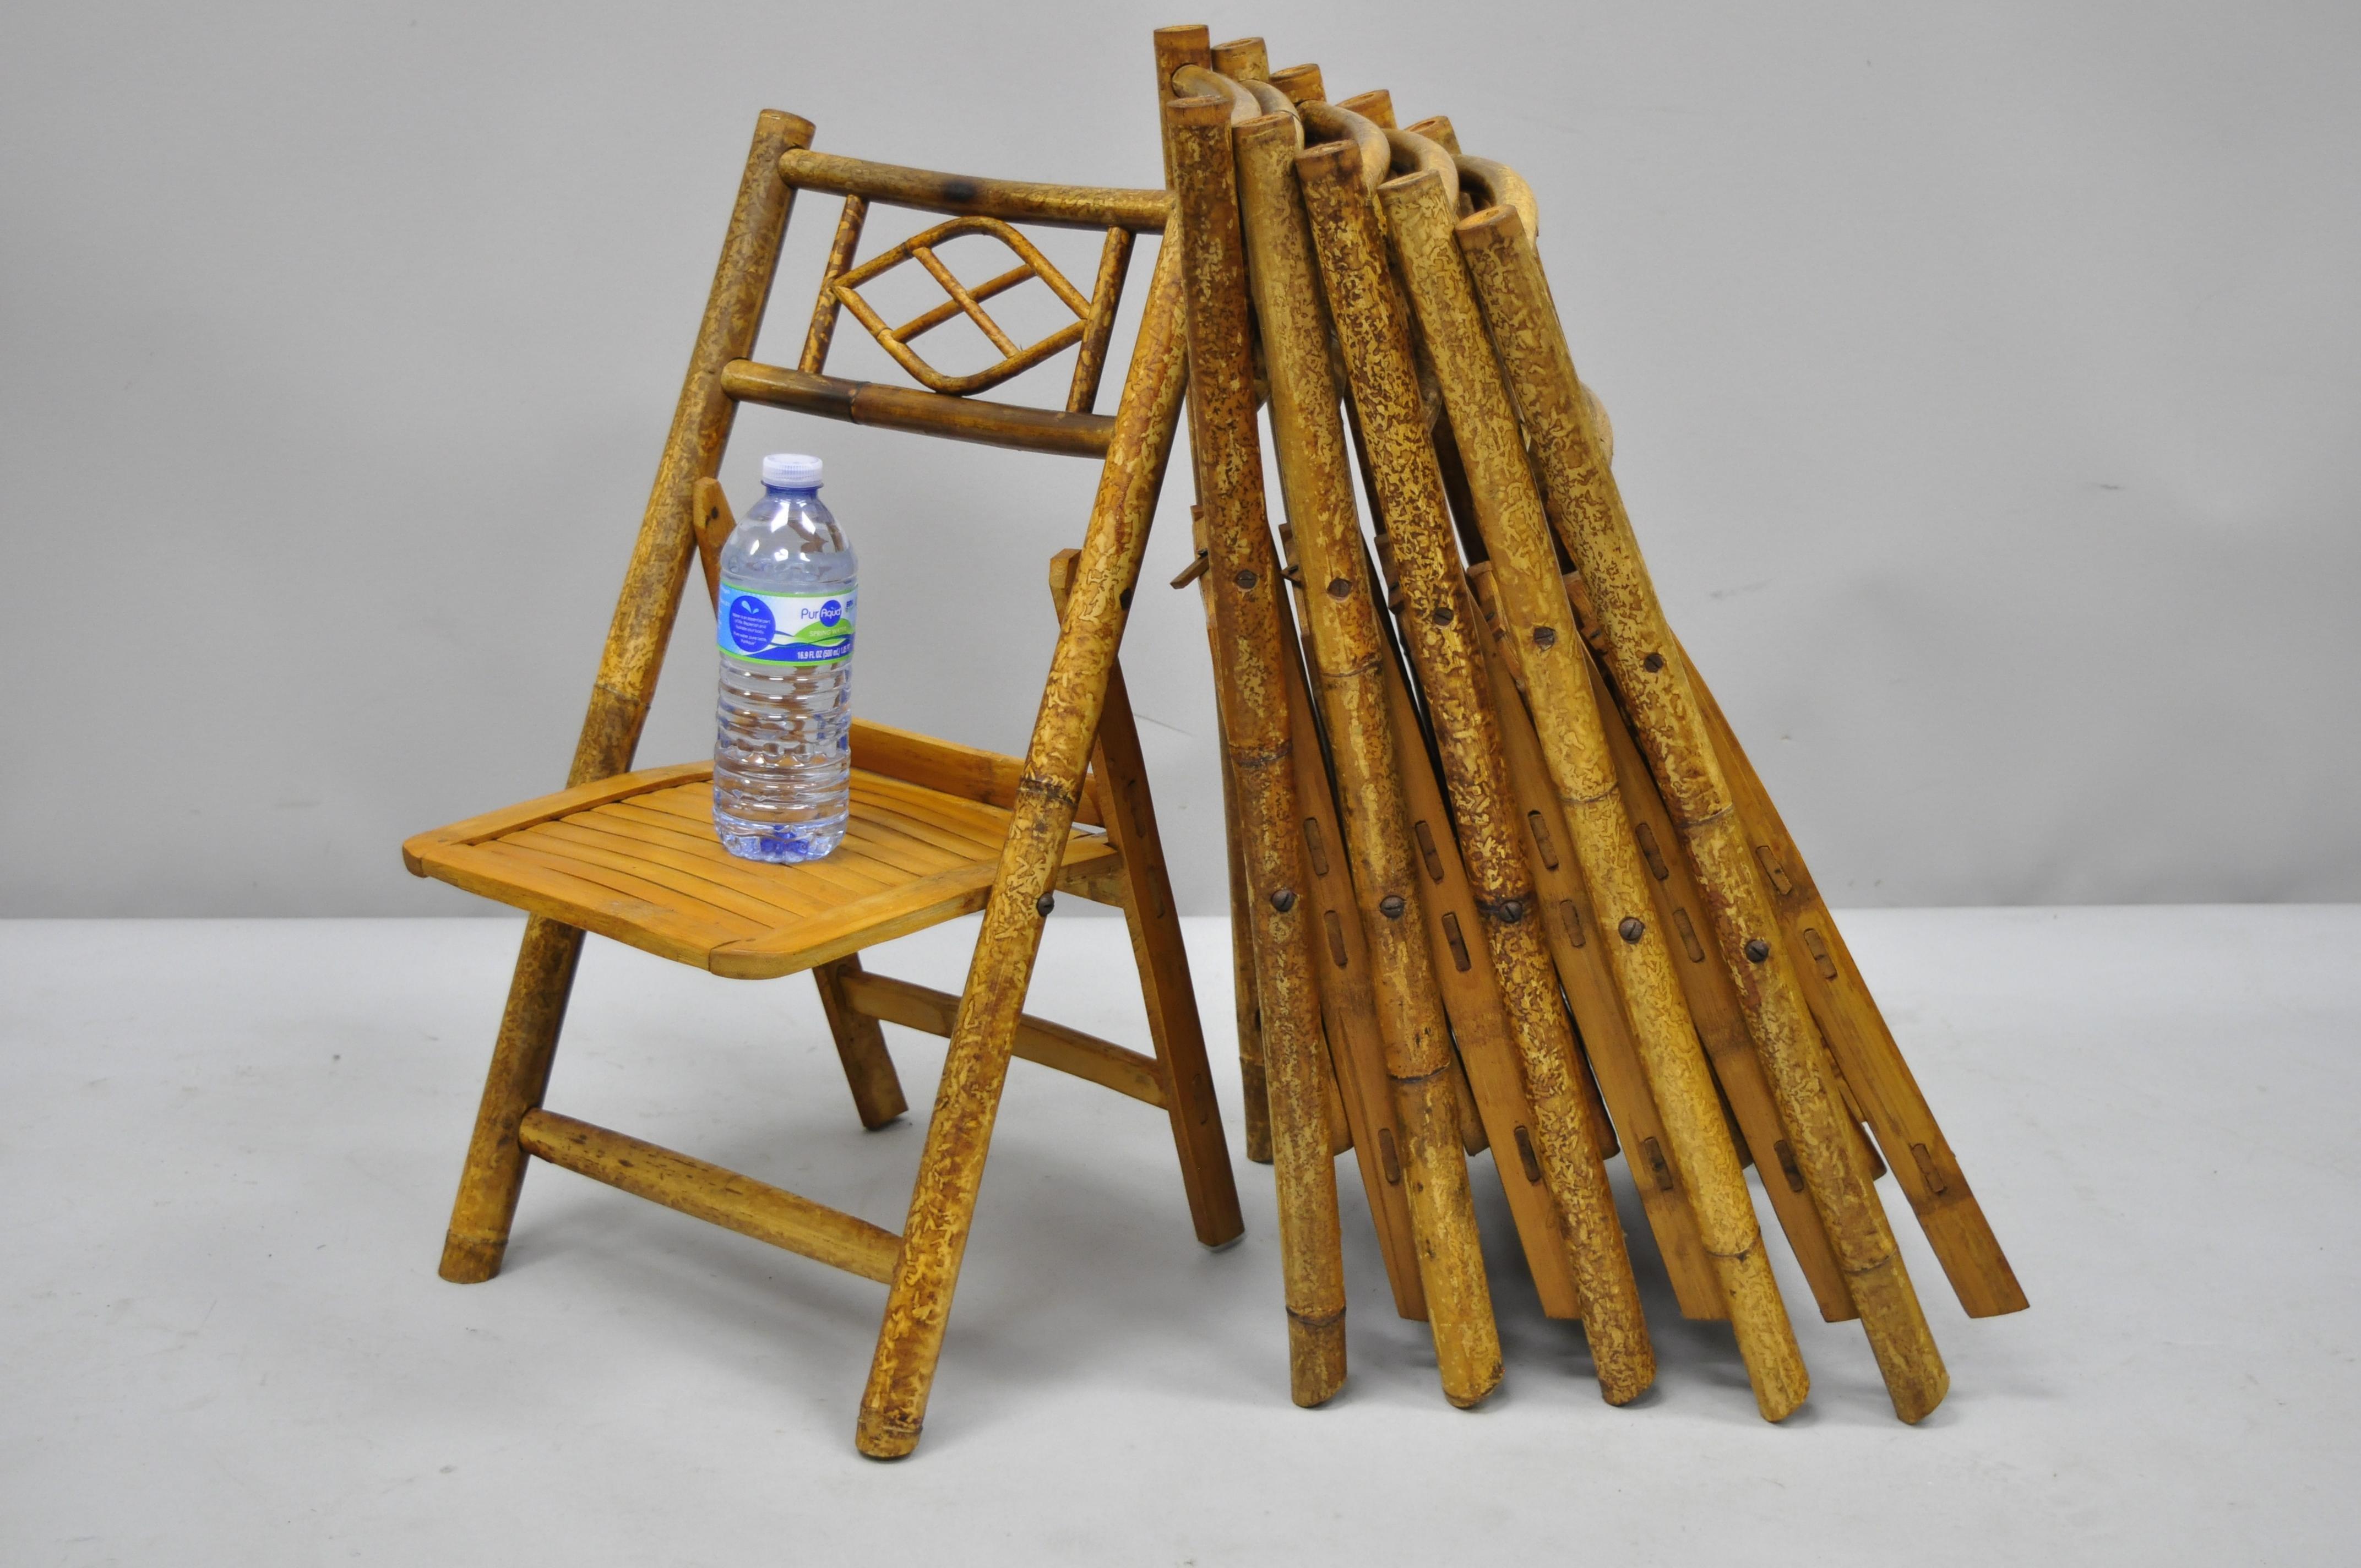 6 Vintage Childrens Bamboo Folding Chairs Tiki Rattan Cane Furniture